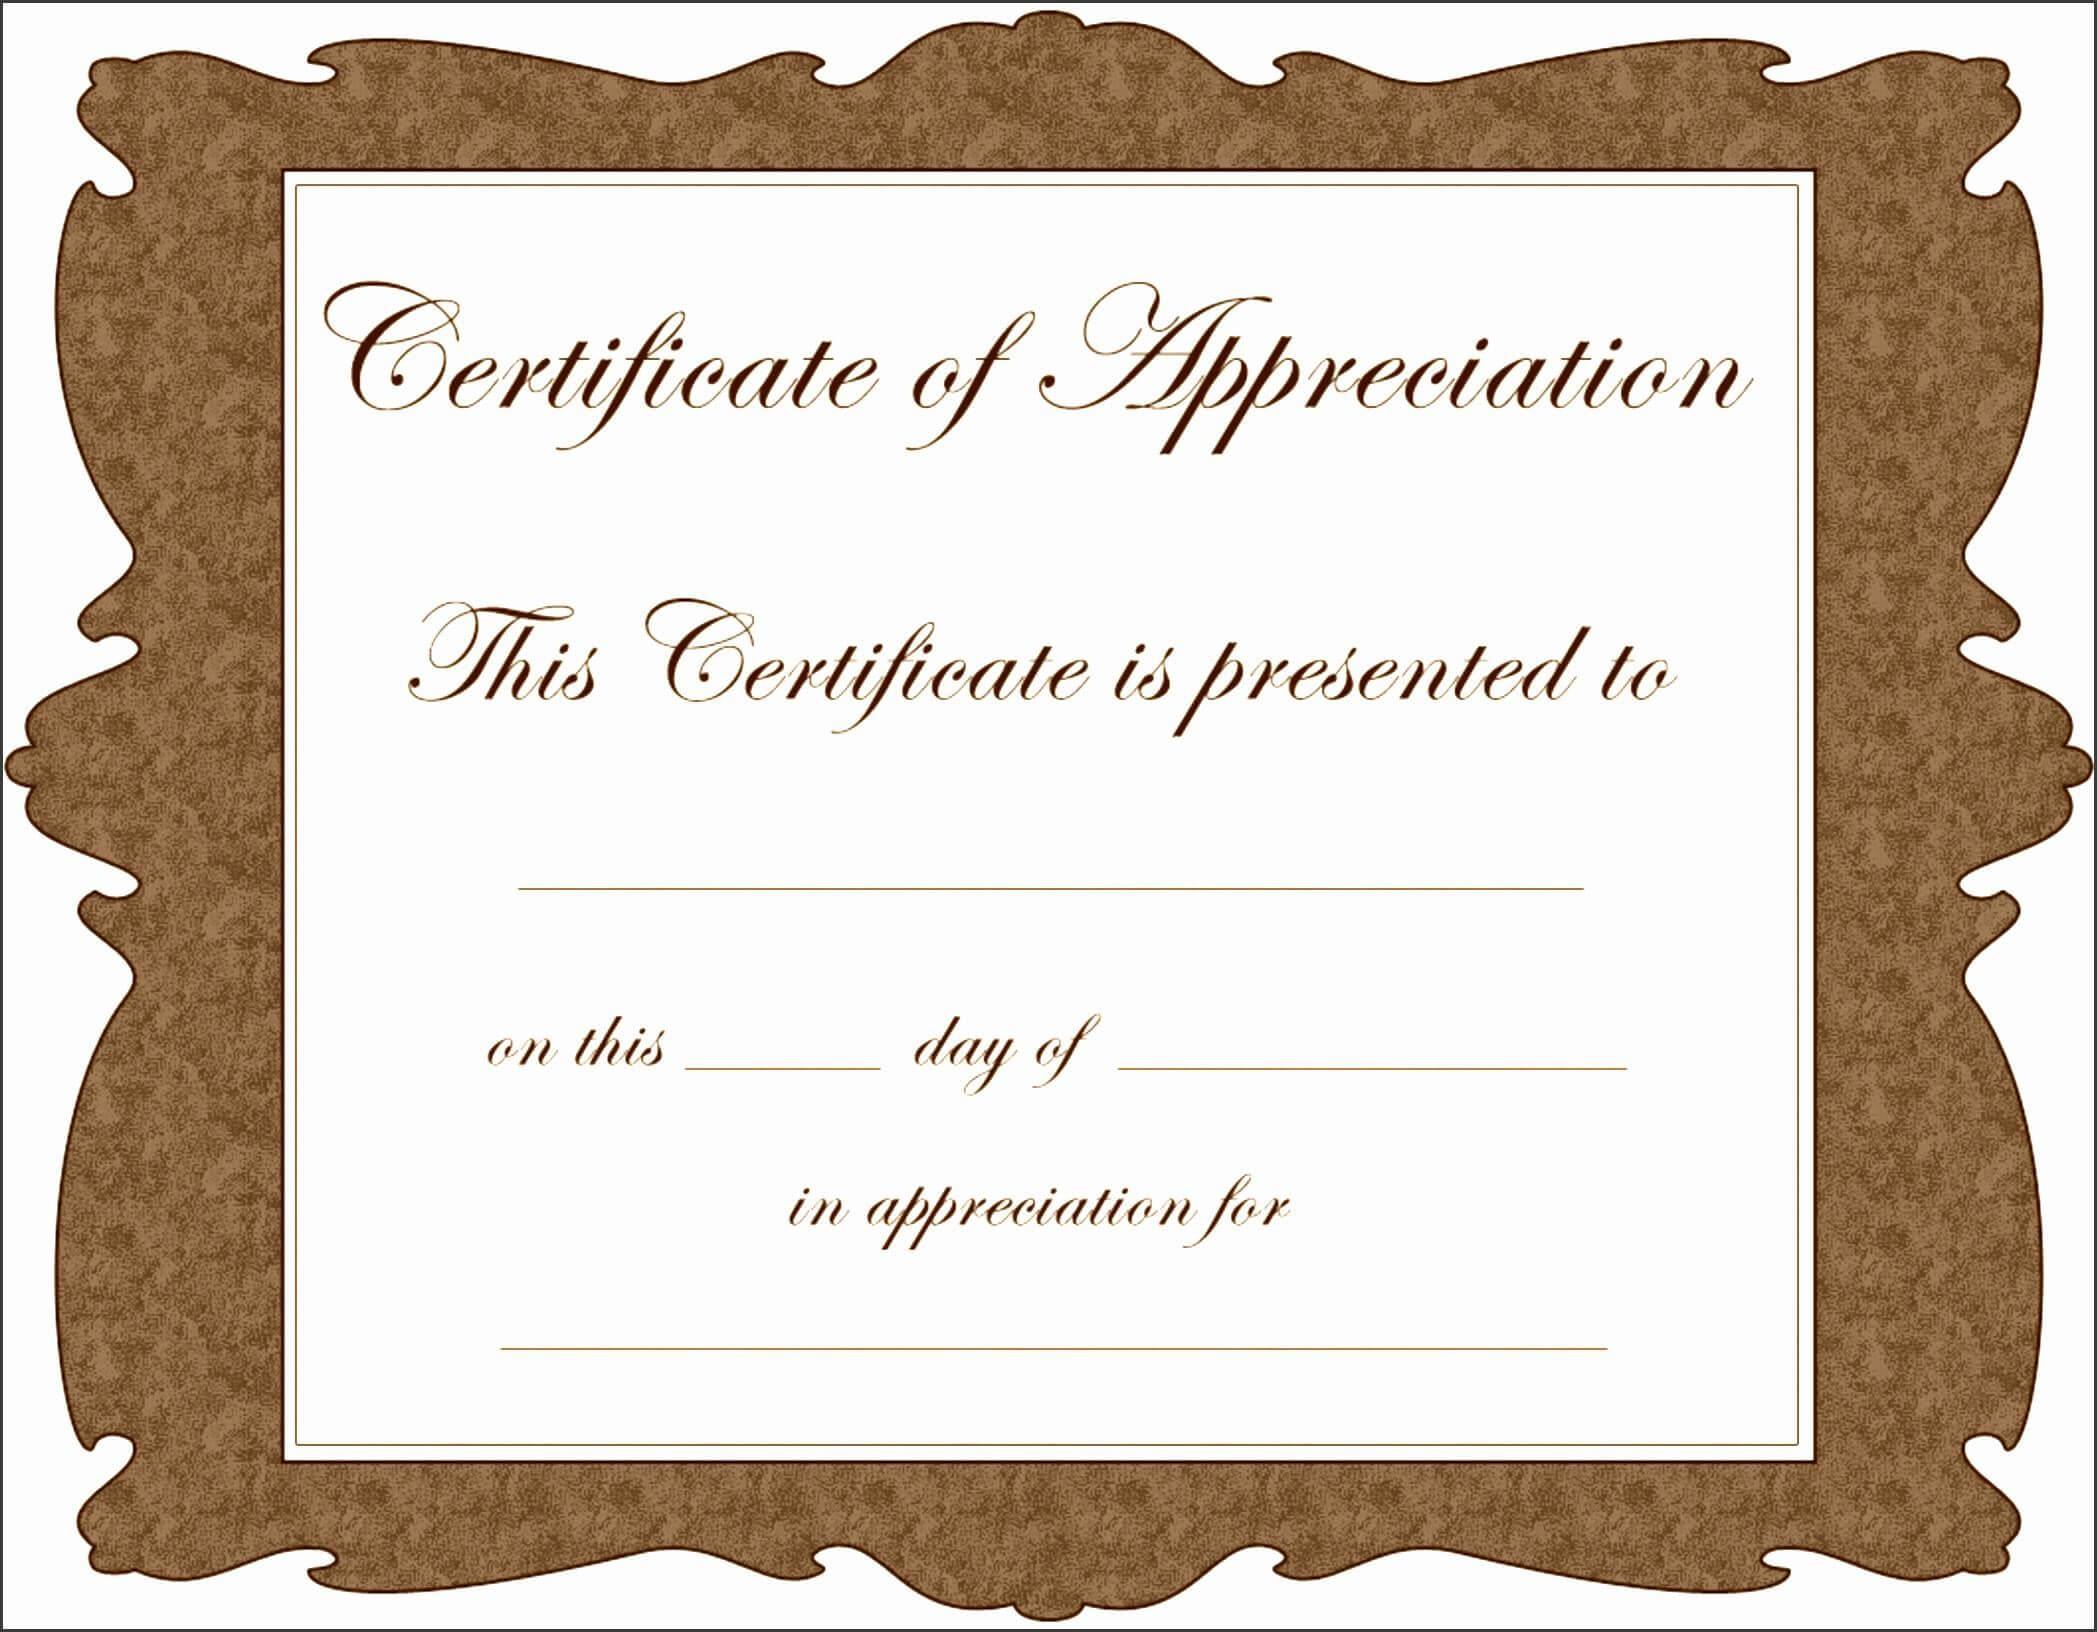 Certificates: Amazing Fake Birth Certificate Template for Fake Birth Certificate Template